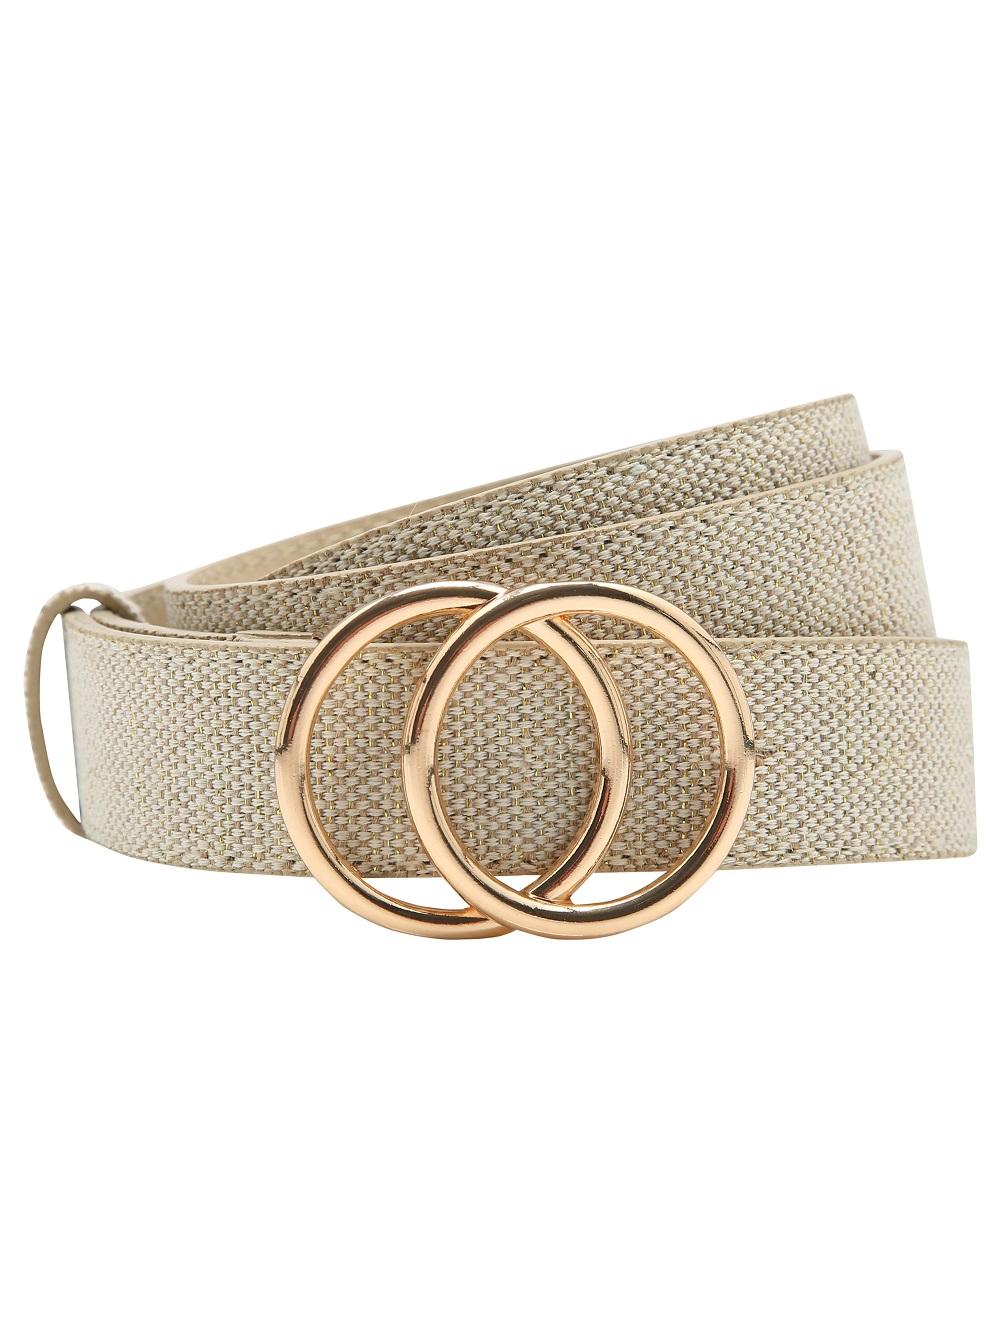 Gold Buckle Woven Belt £8.99 M&CO